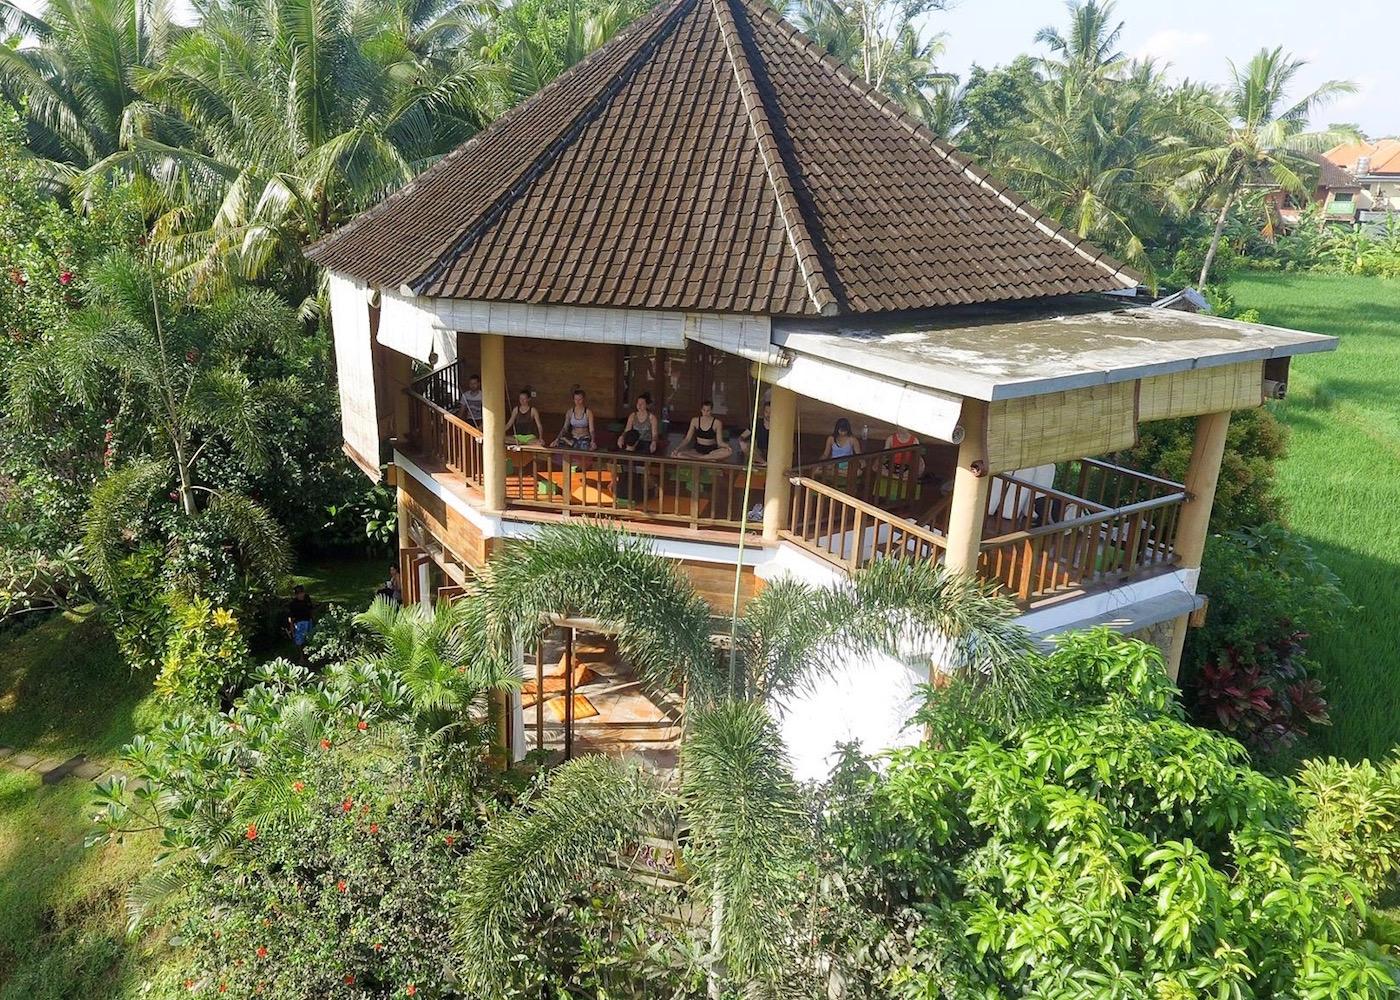 Studio at Ubud Yoga House in Bali, Indonesia